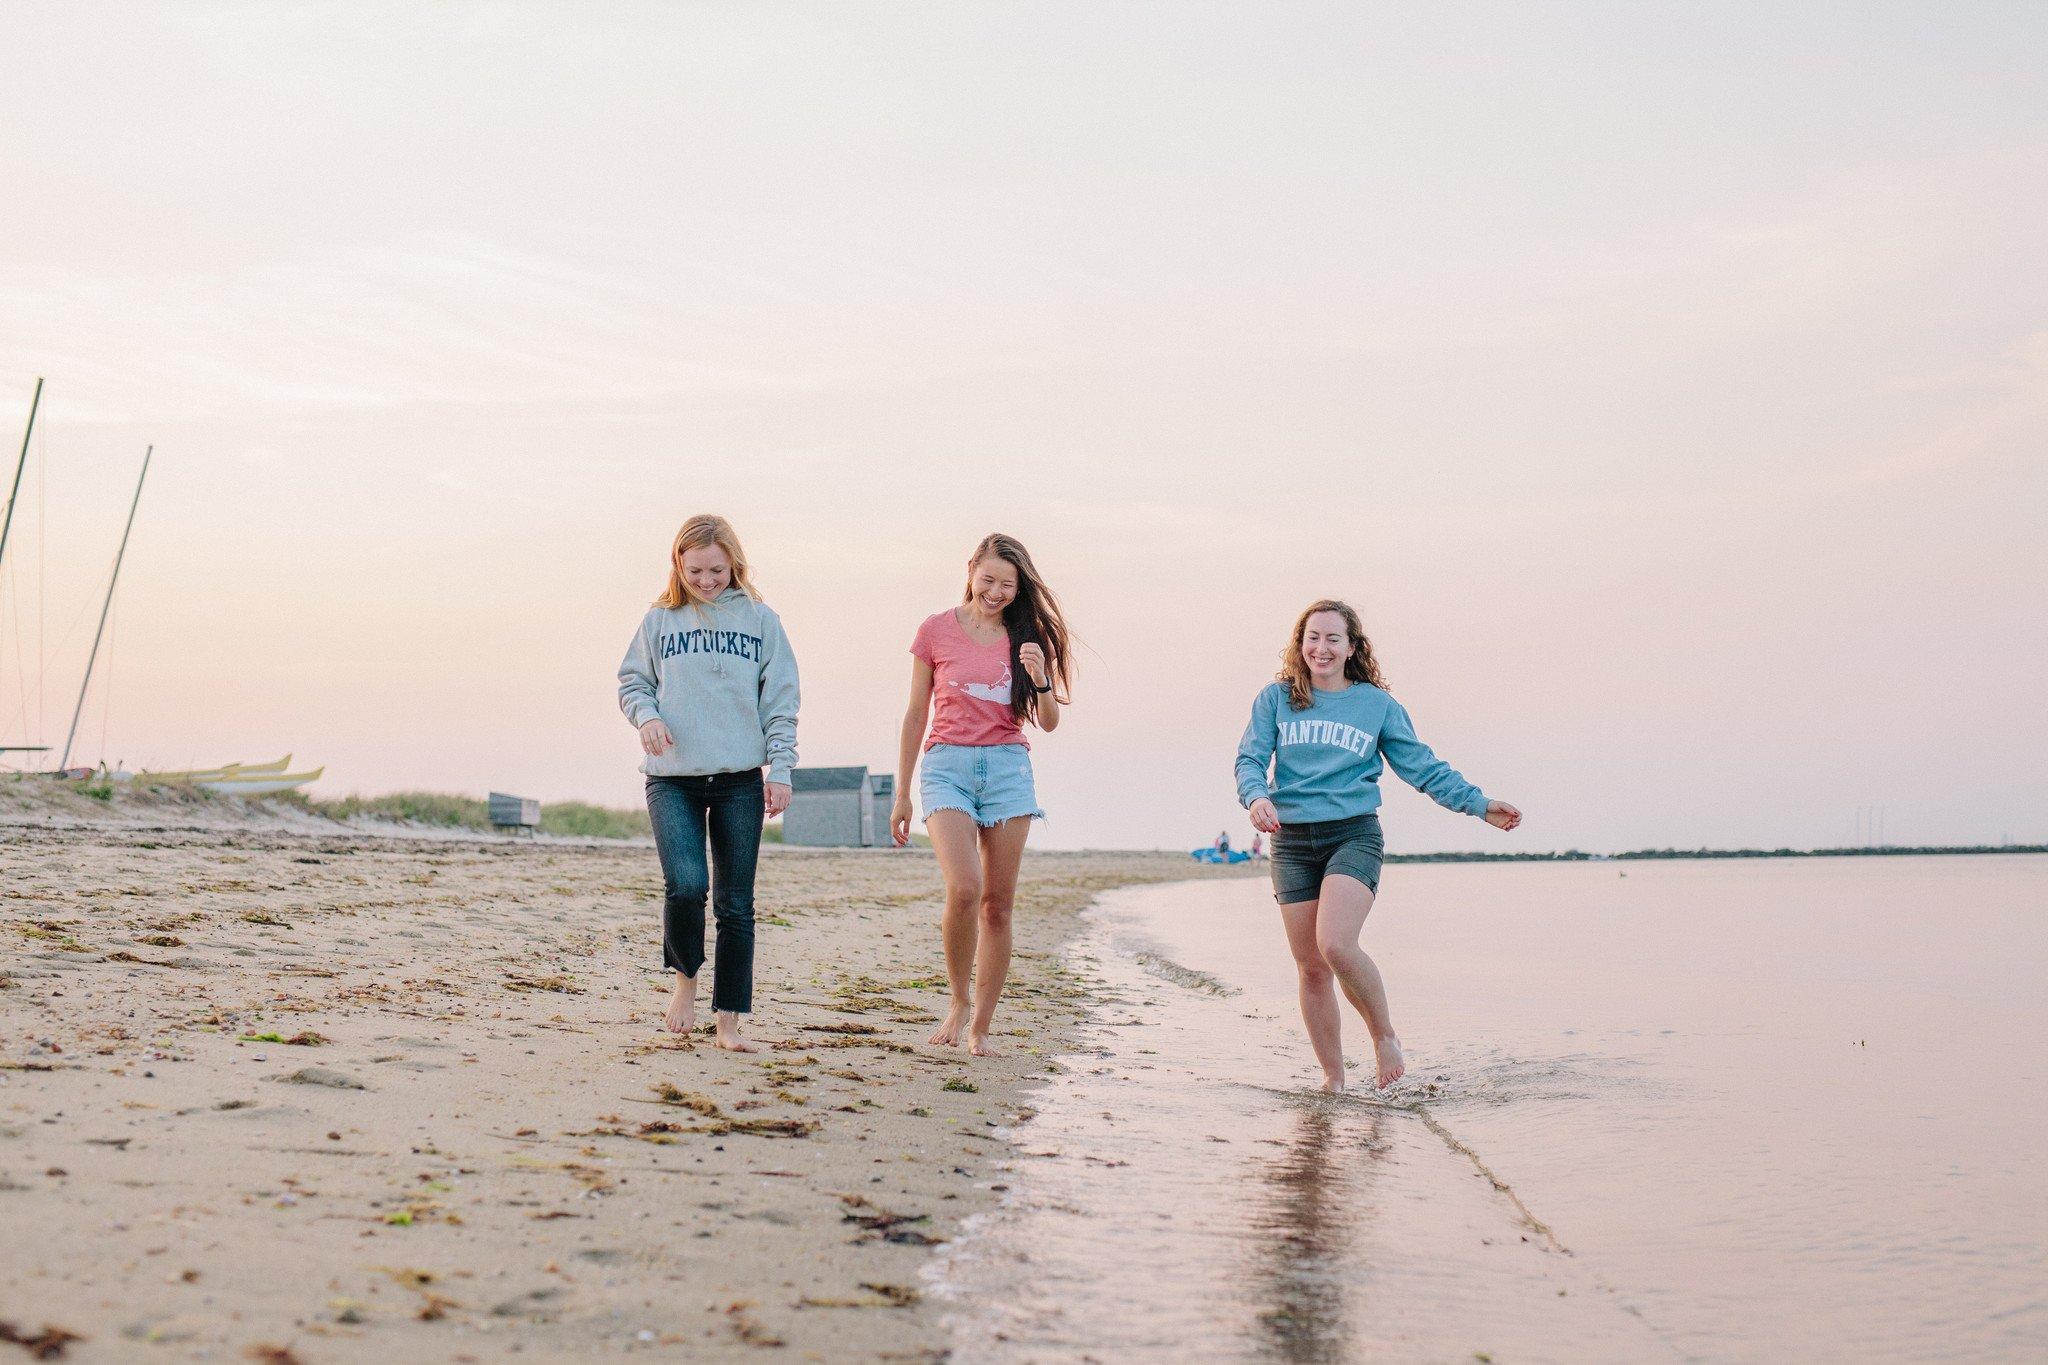 Nantucket sweatshirts and t-shirts